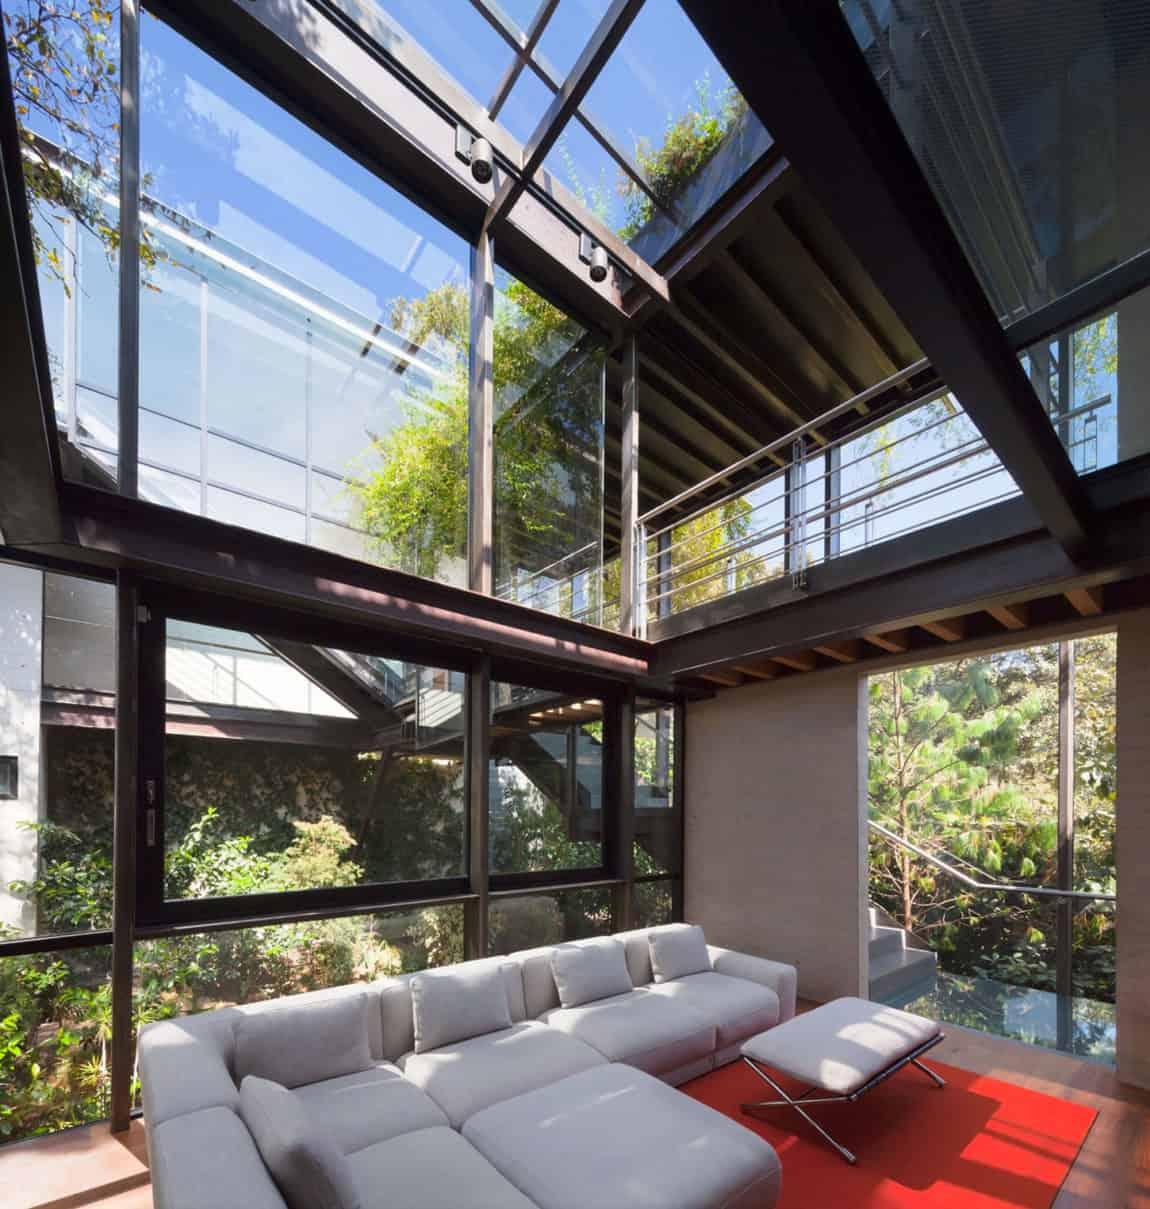 Tepozcuautla House by grupoarquitectura (14)